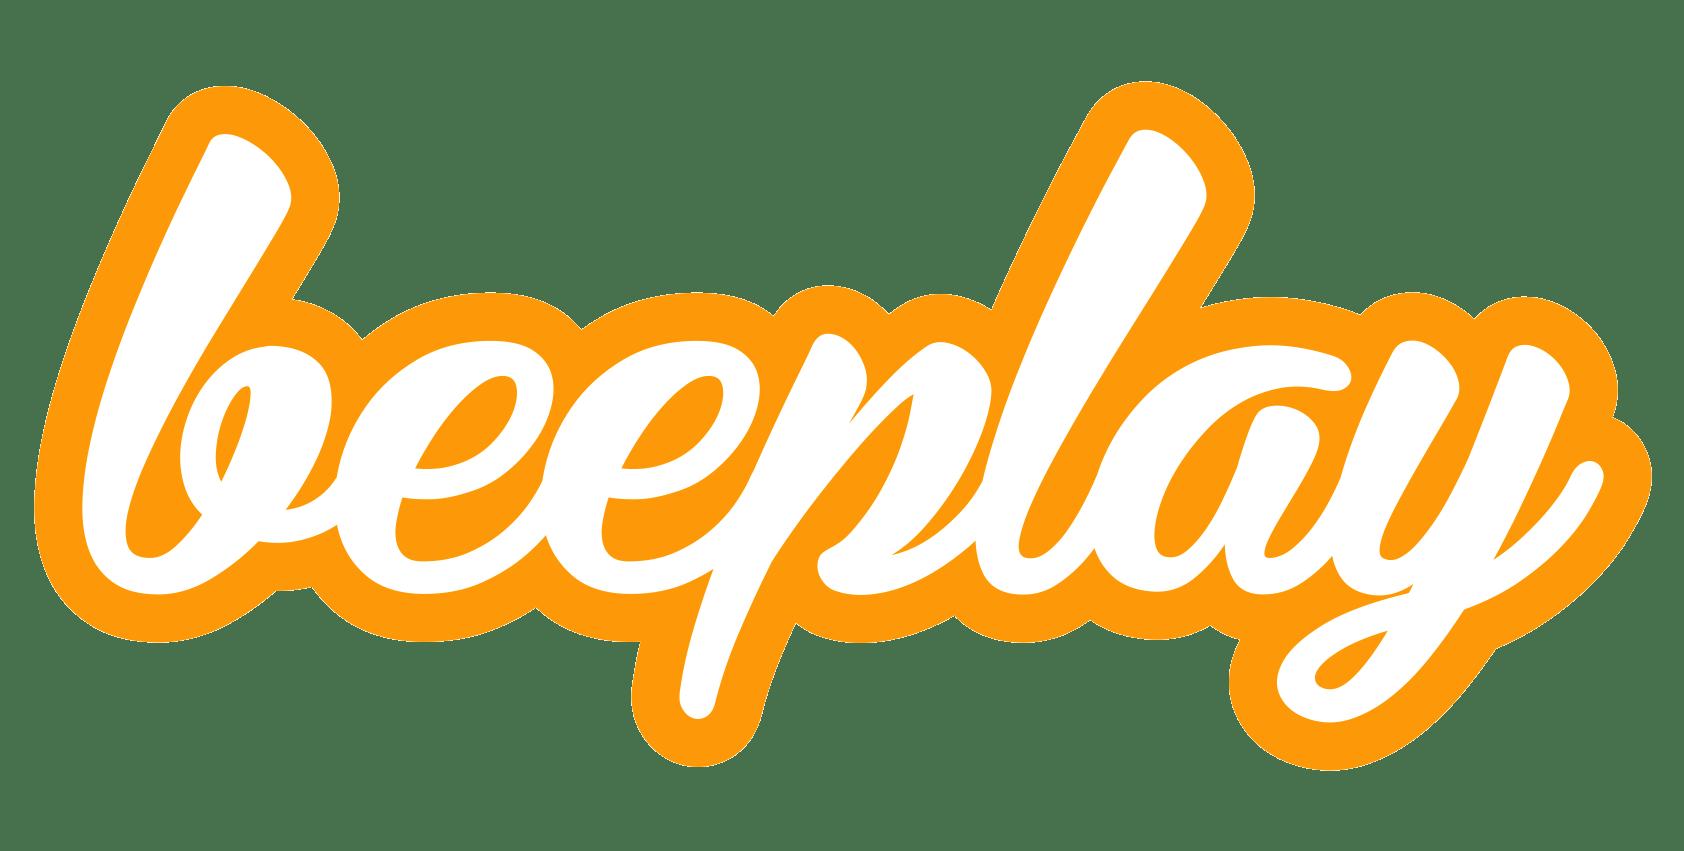 beeplay